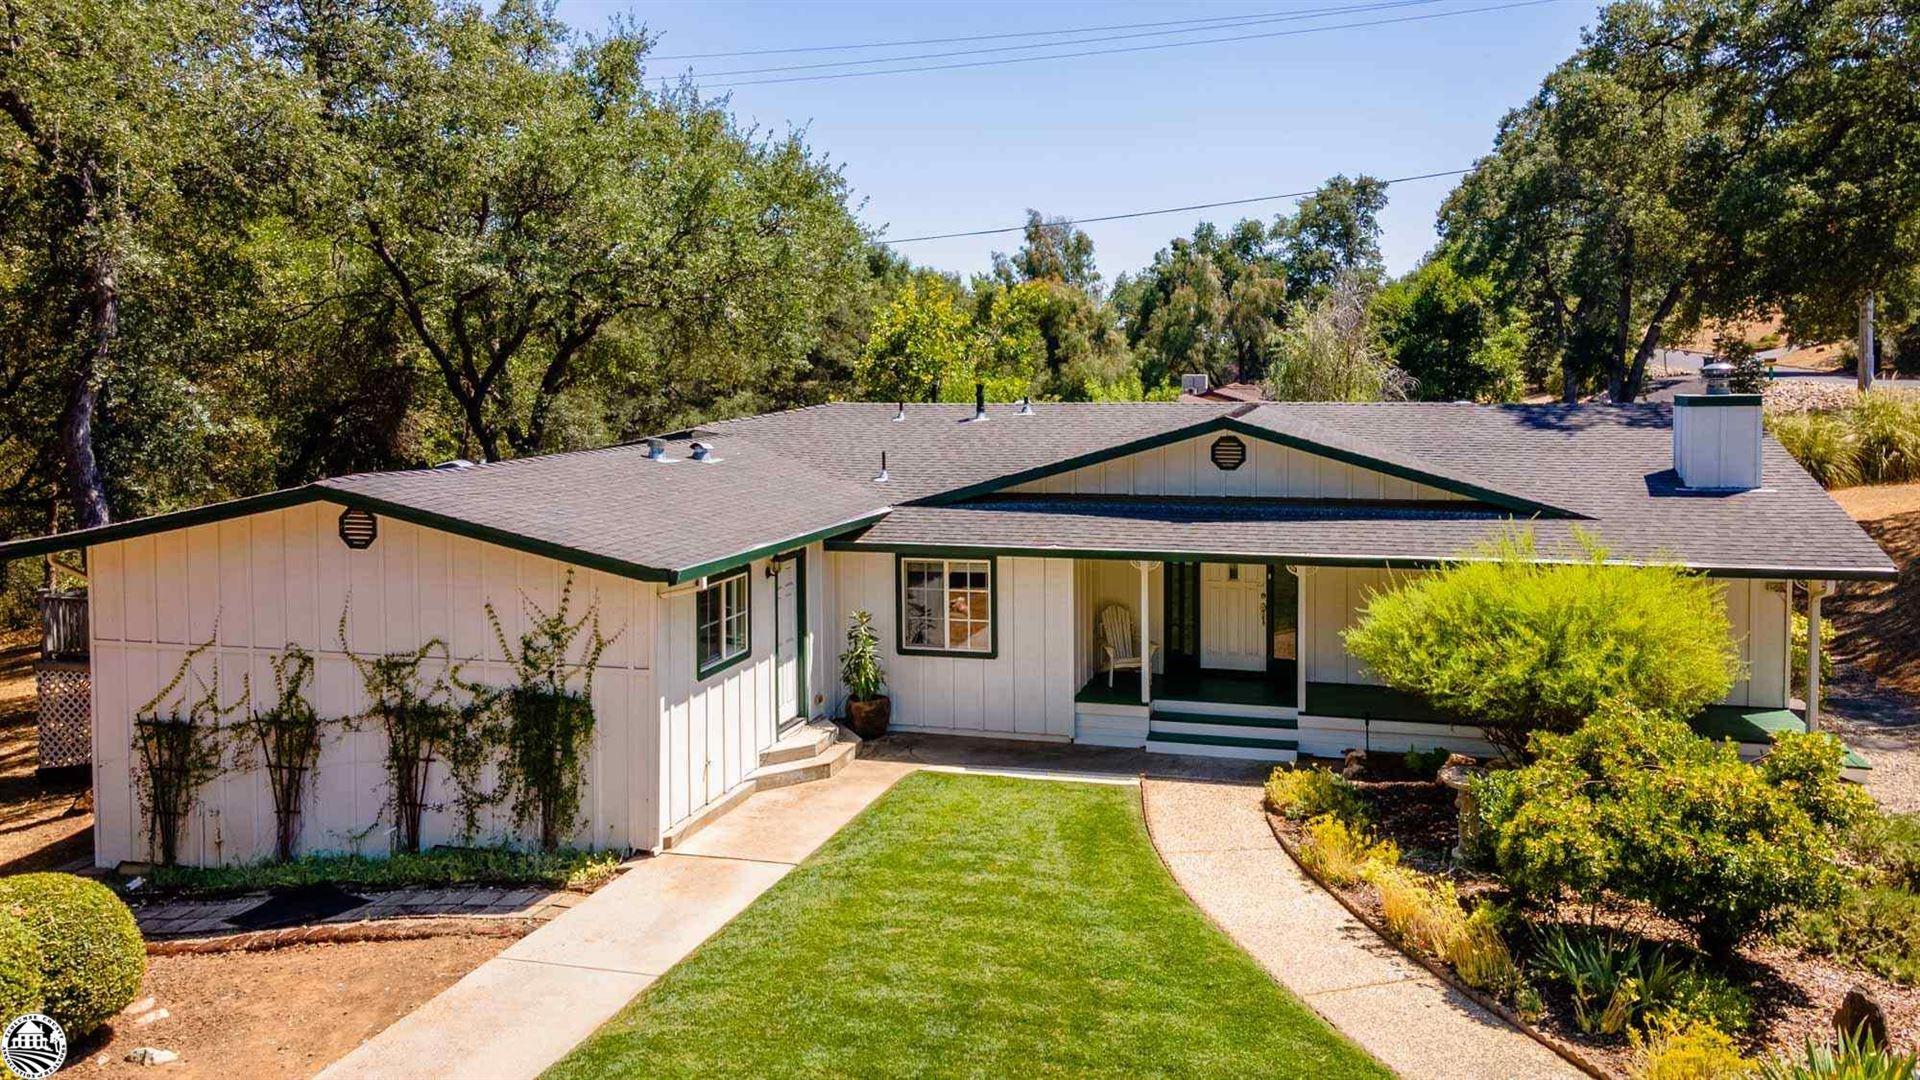 18561 Pradera Real Road Road, Sonora, CA 95370 - MLS#: 20201048